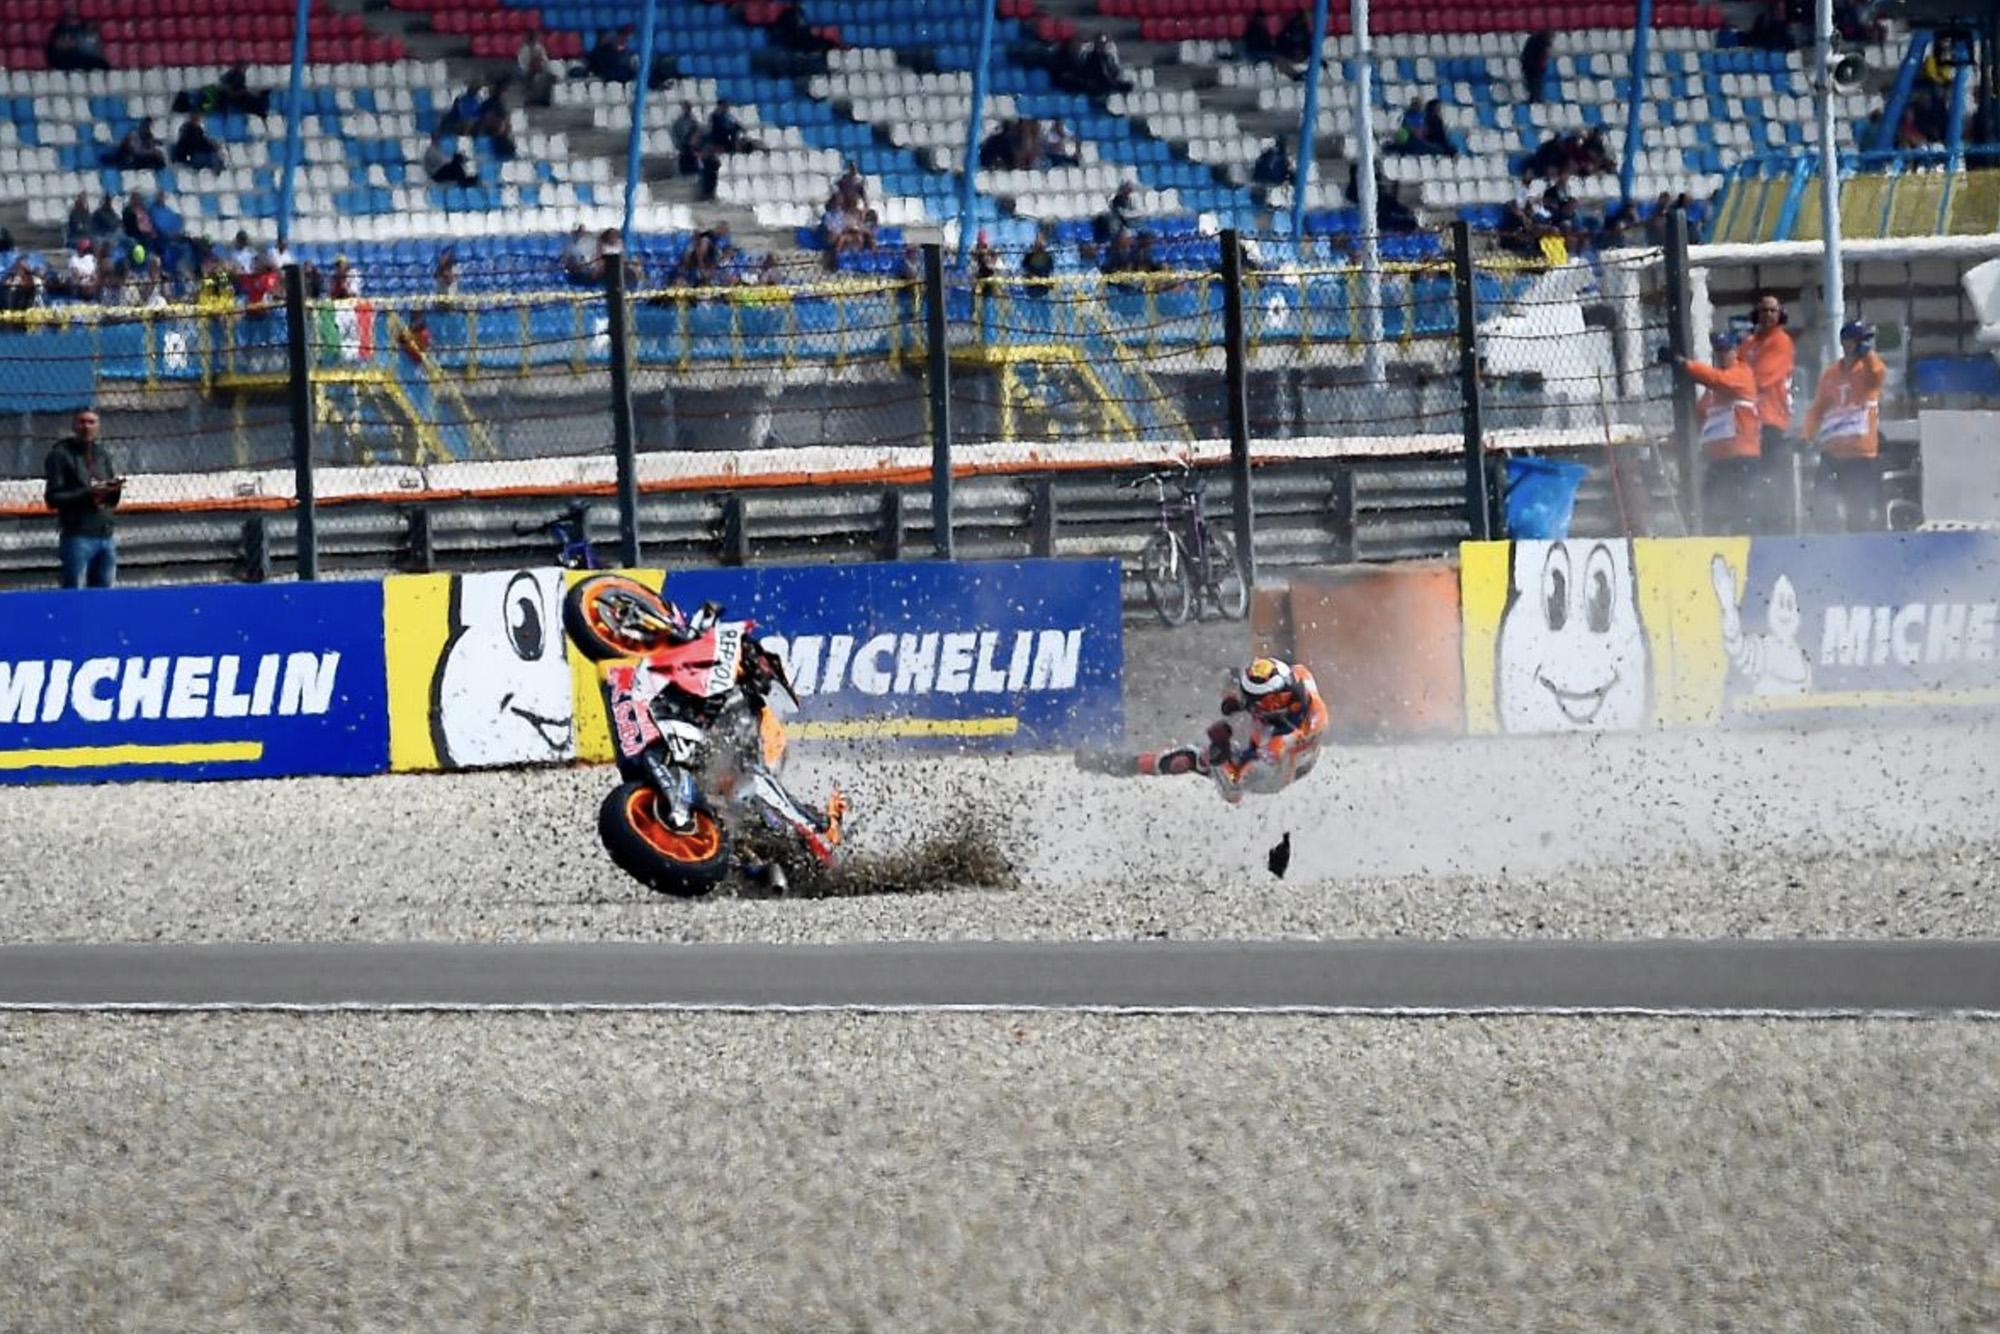 Jorge Lorenzo's crash during the Dutch TT in 2019